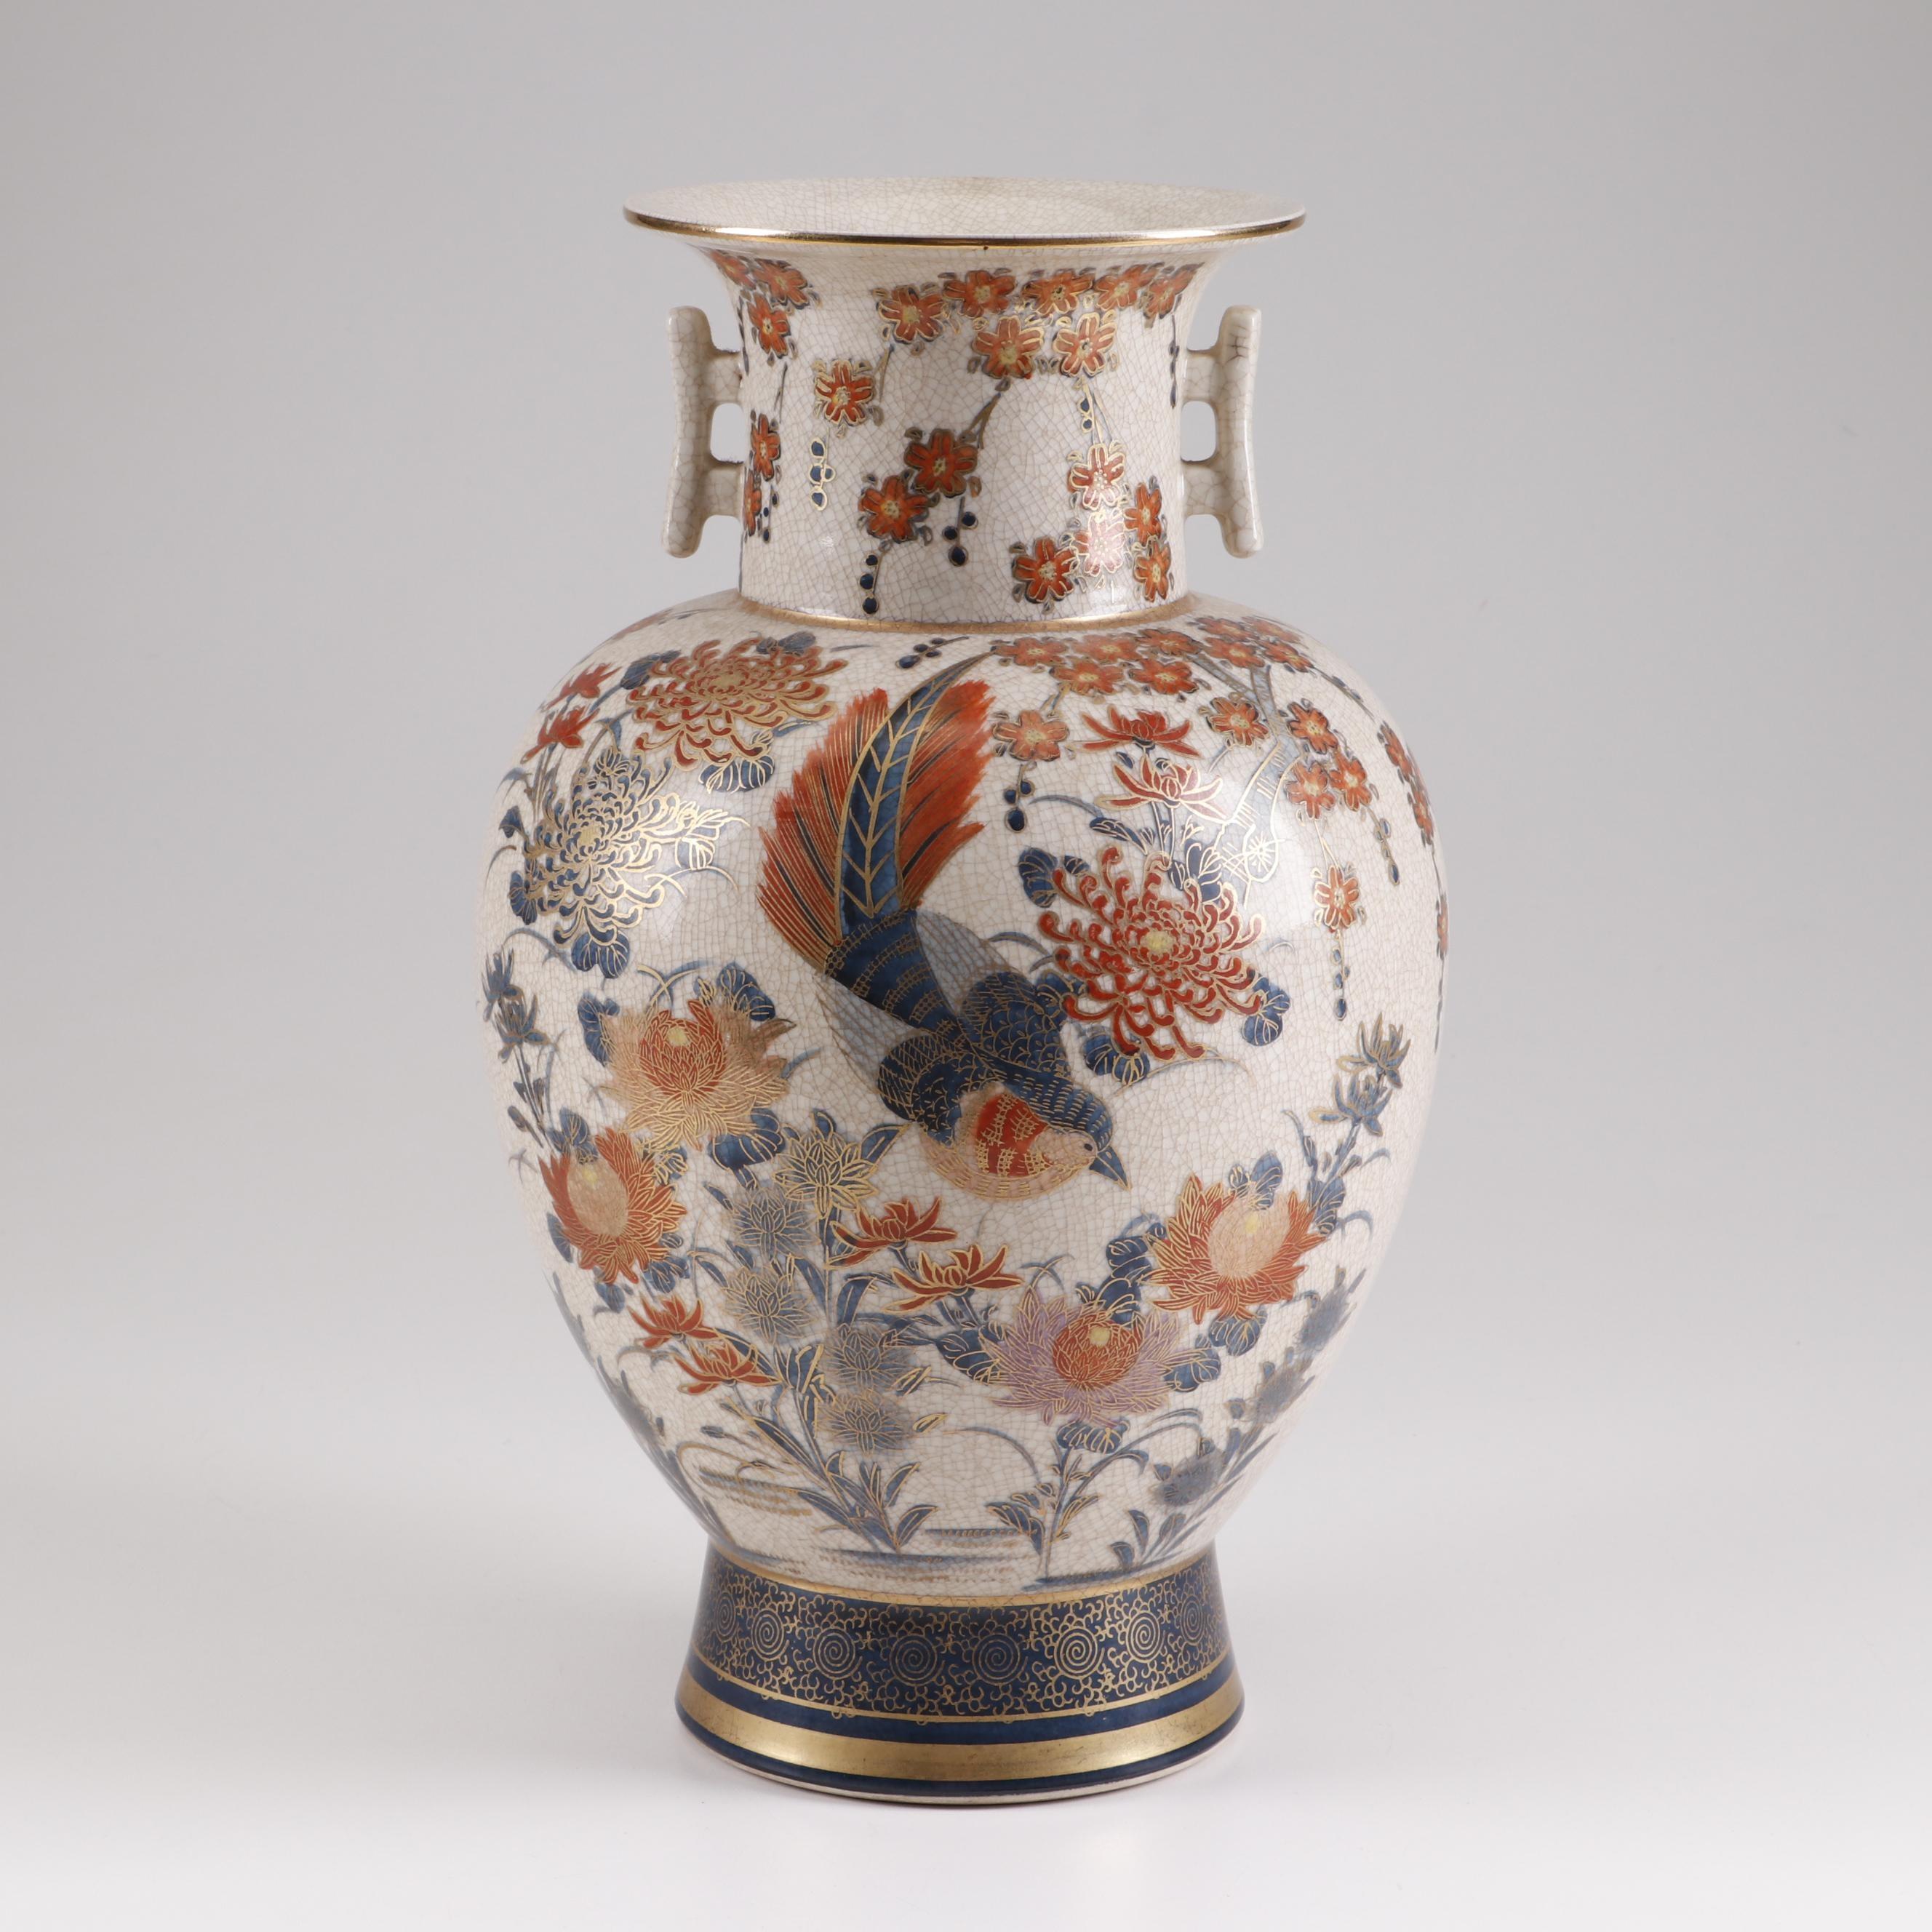 Japanese Hand Painted Imari Style Ceramic Vase, 20th Century